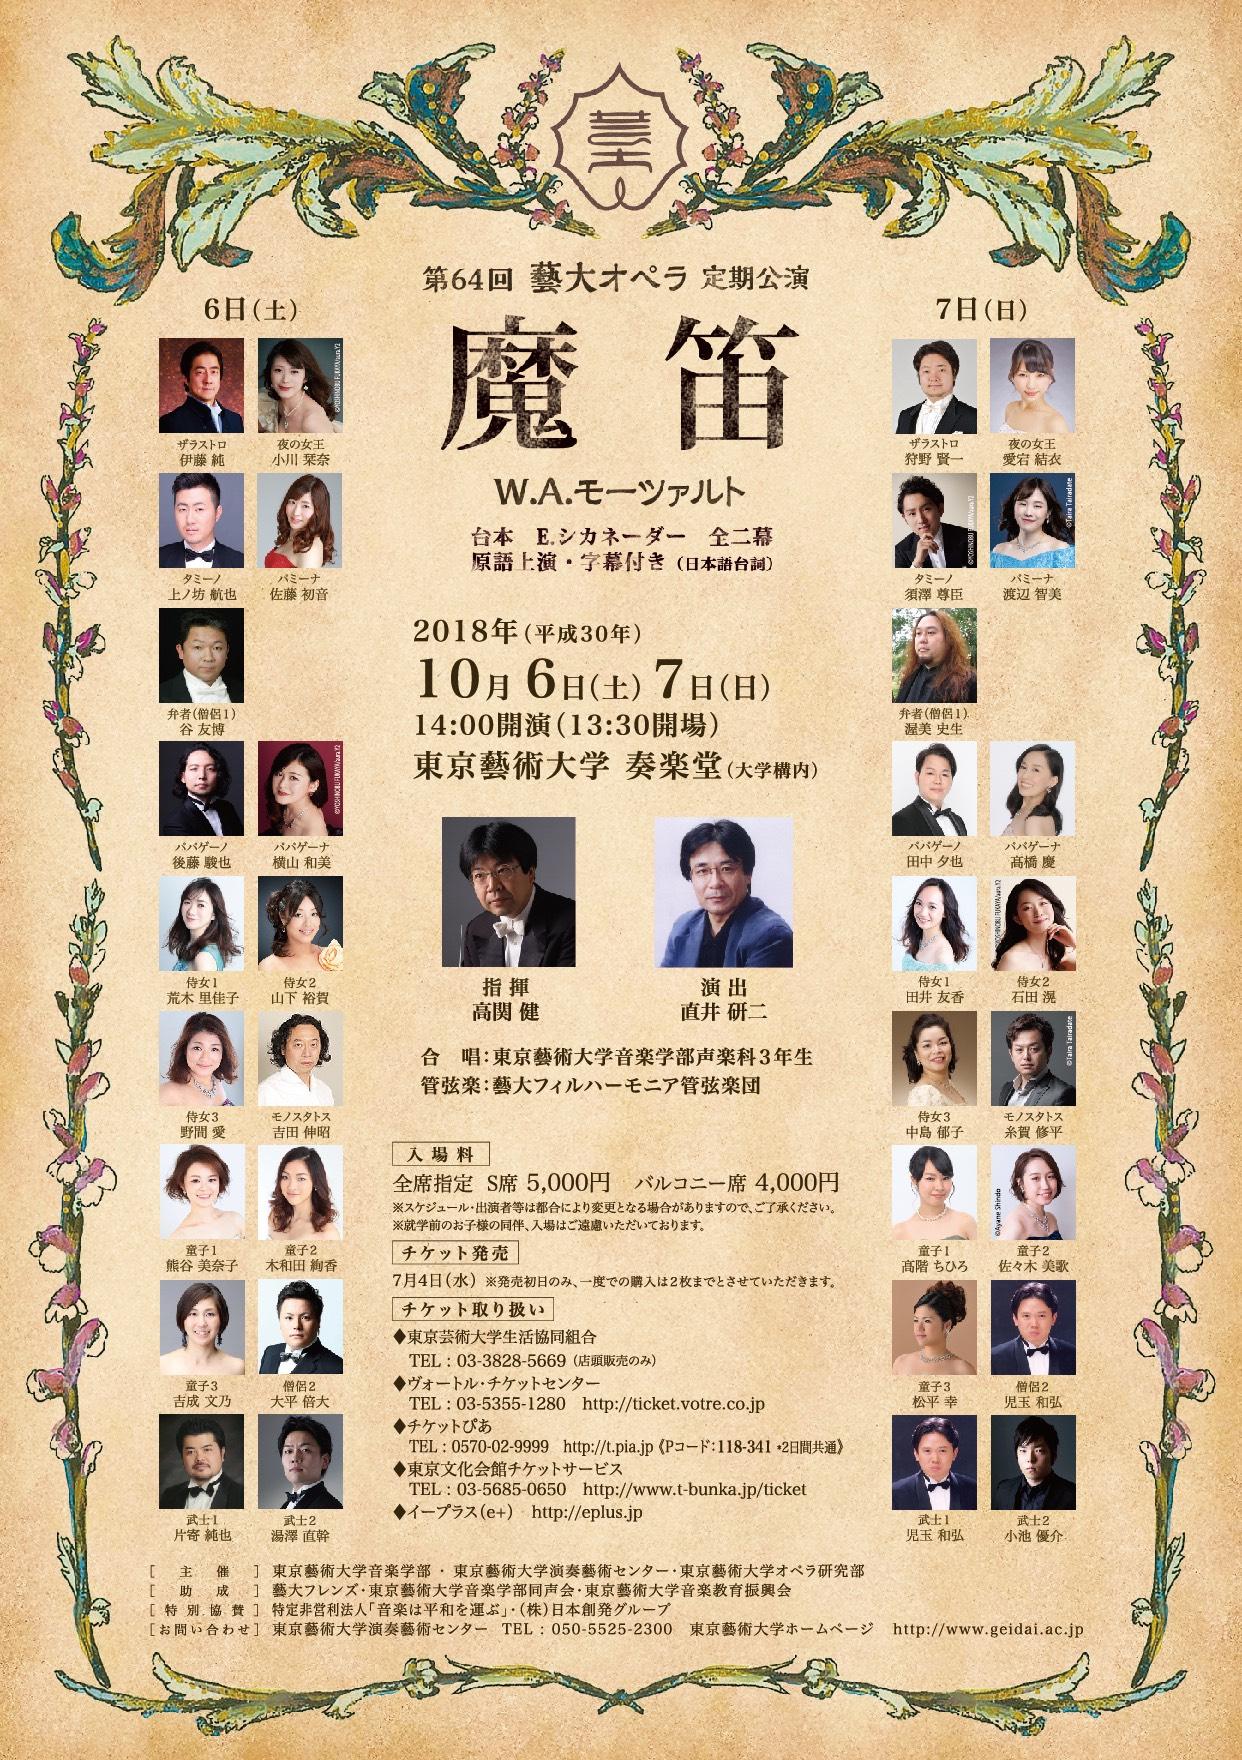 第64回藝大オペラ定期公演「魔笛」